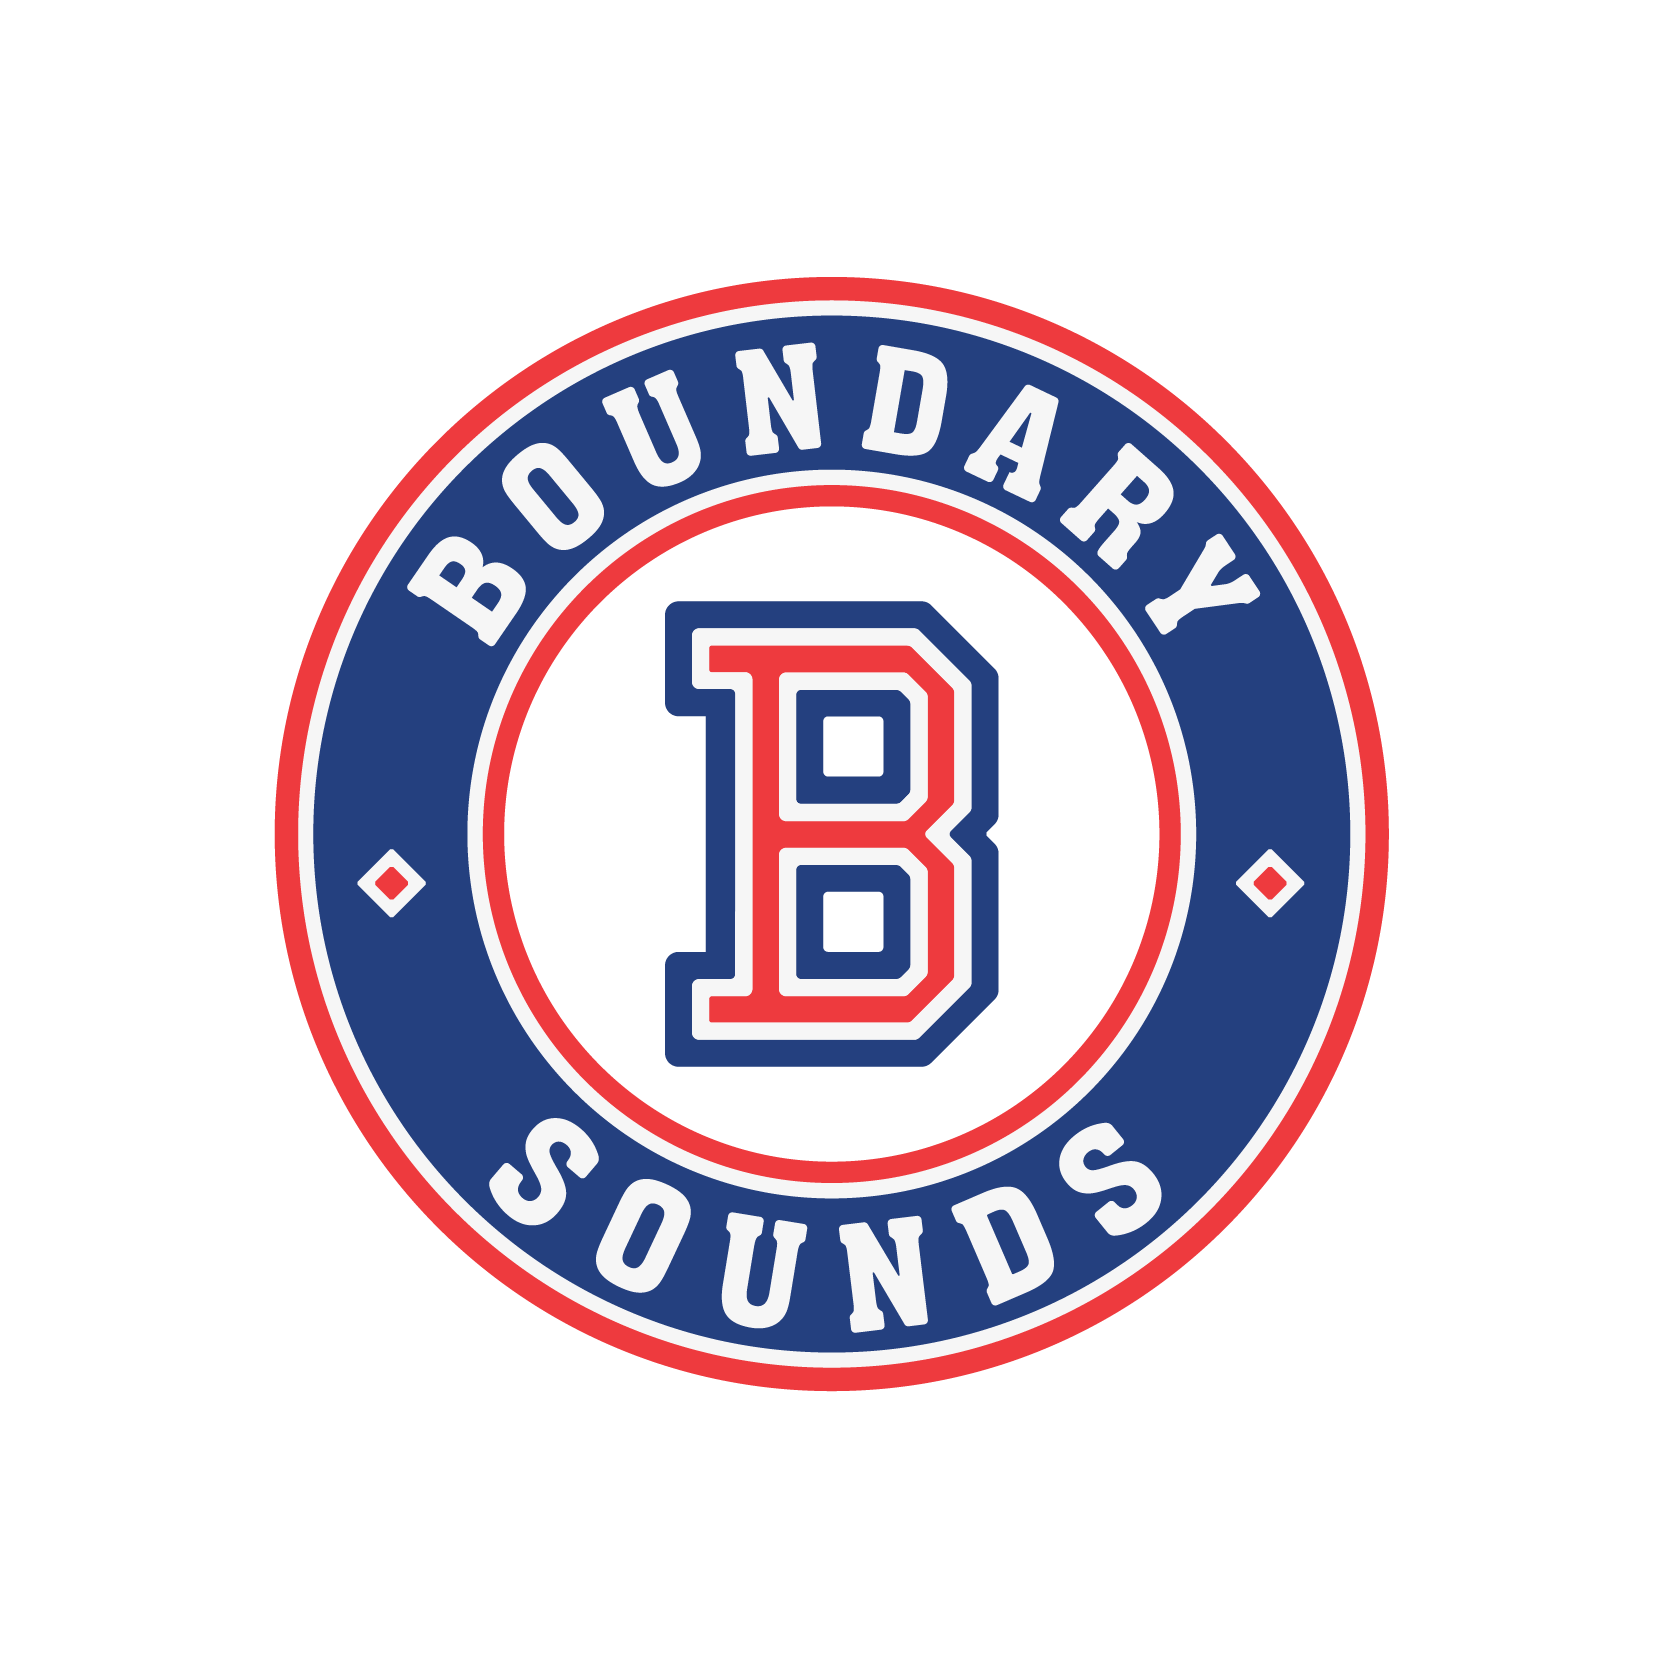 BoundarySounds_logo_STAMP_colour.png